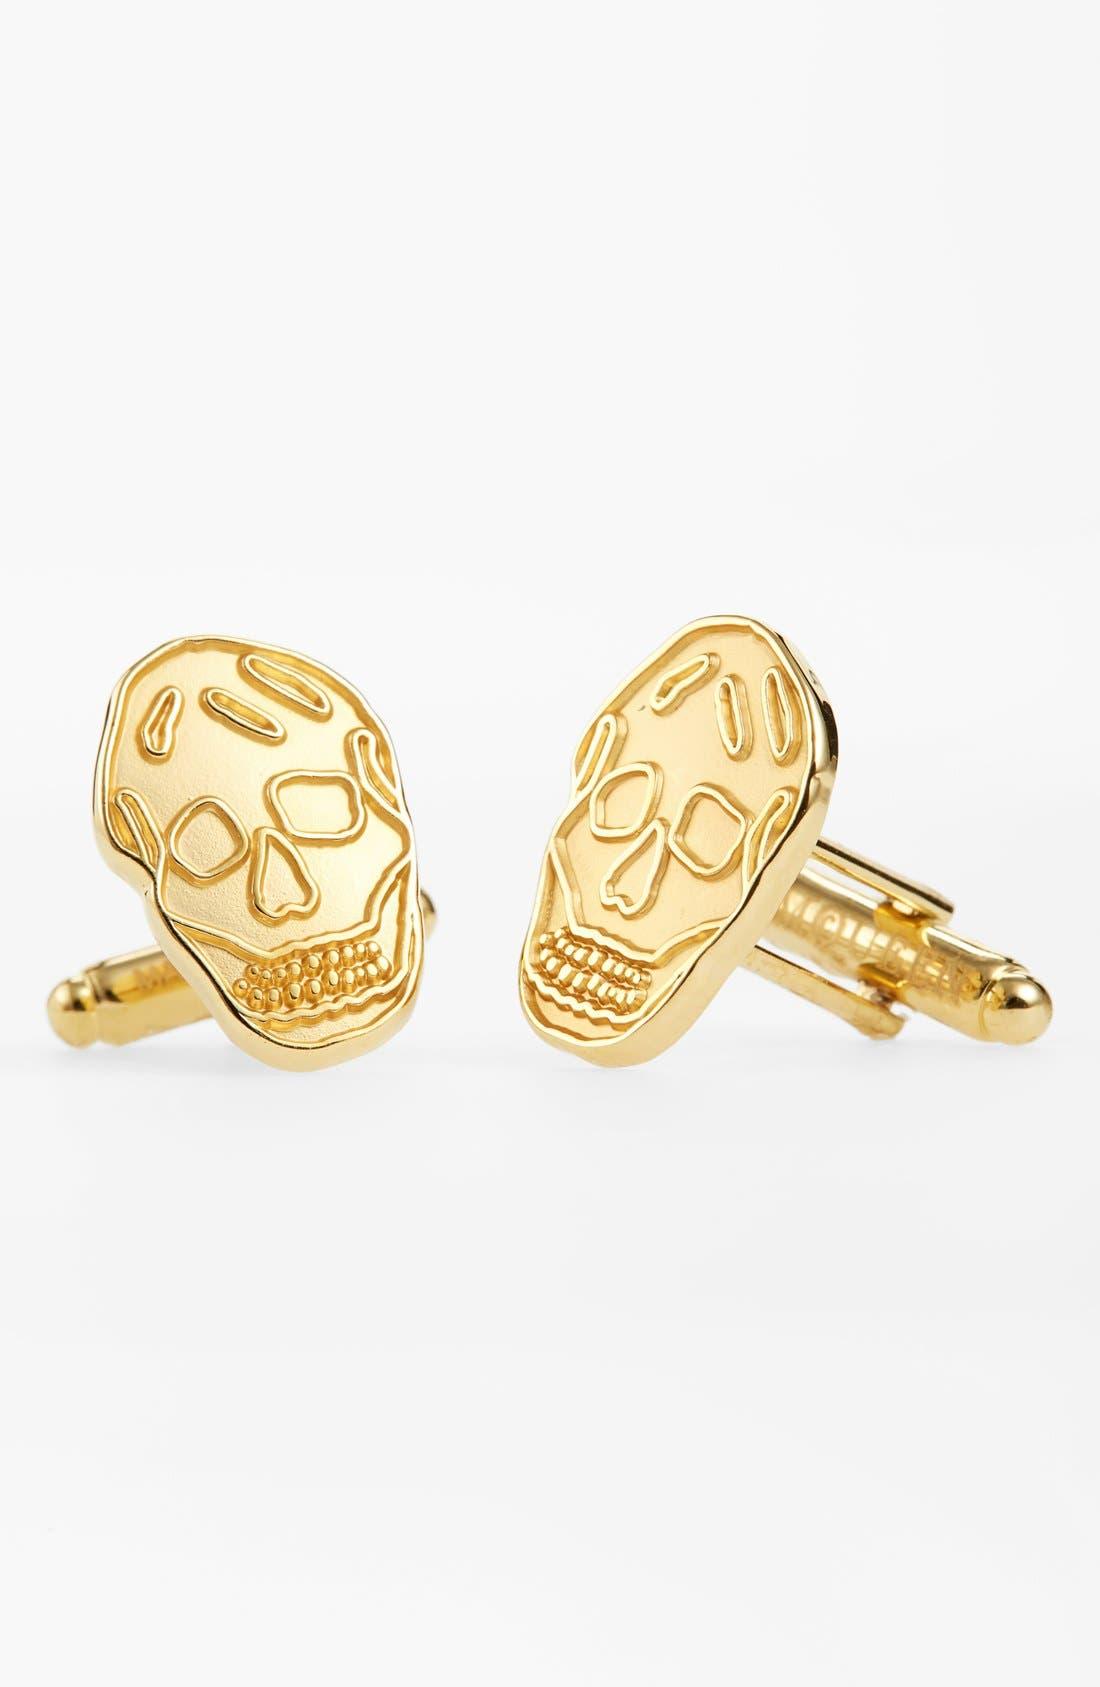 Brass Skull Cuff Links,                         Main,                         color, 712